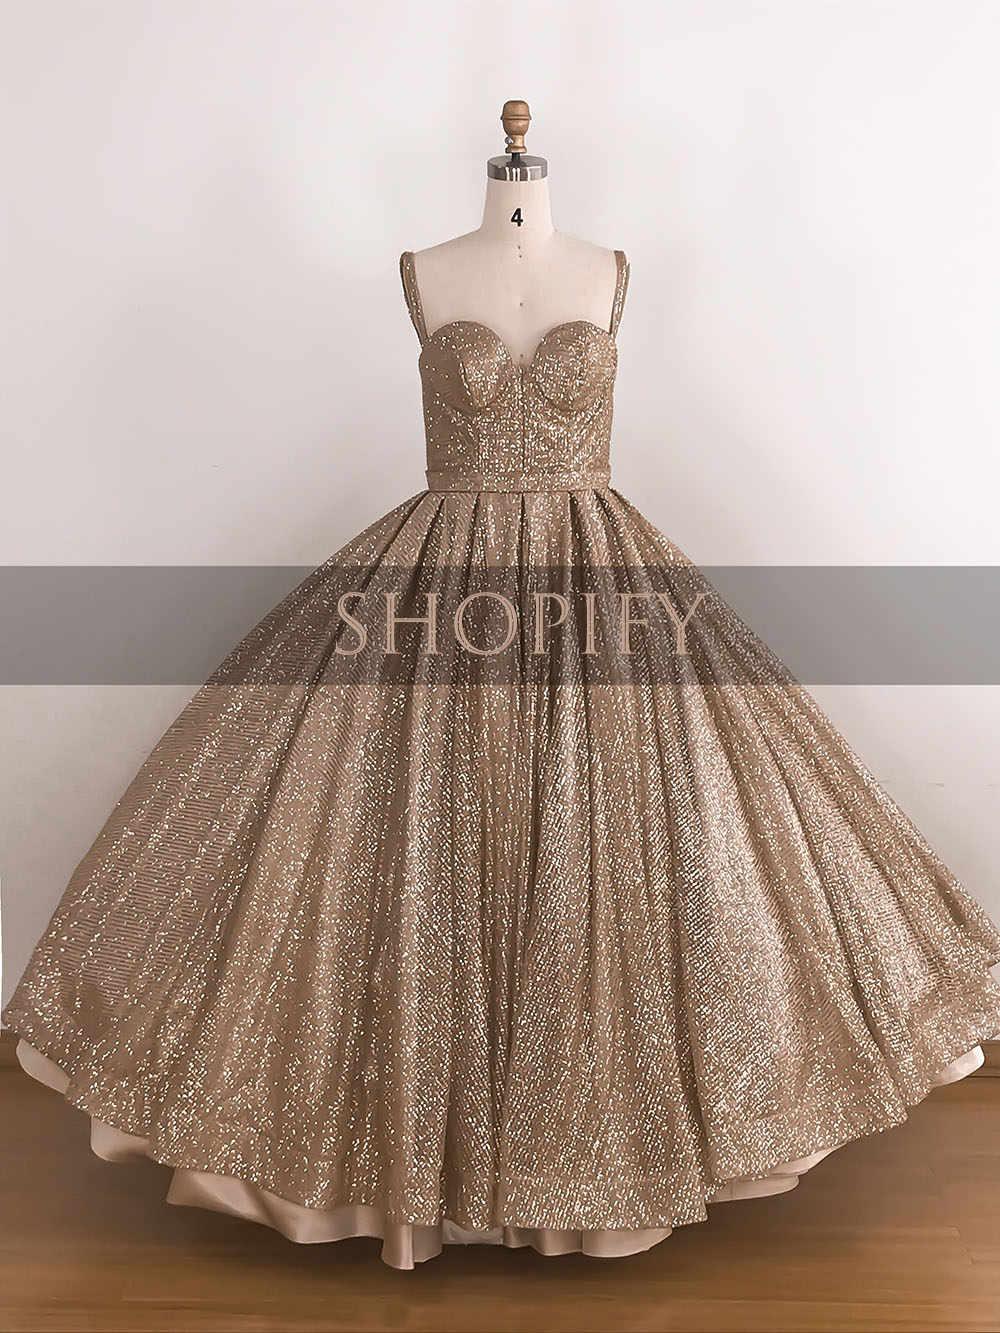 8b082932fa Long Glitter Lebanon Arabic Style Evening Dresses 2019 Ball Gown Puffy  Swwetheart Sparkly Formal Women Gowns abendkleider